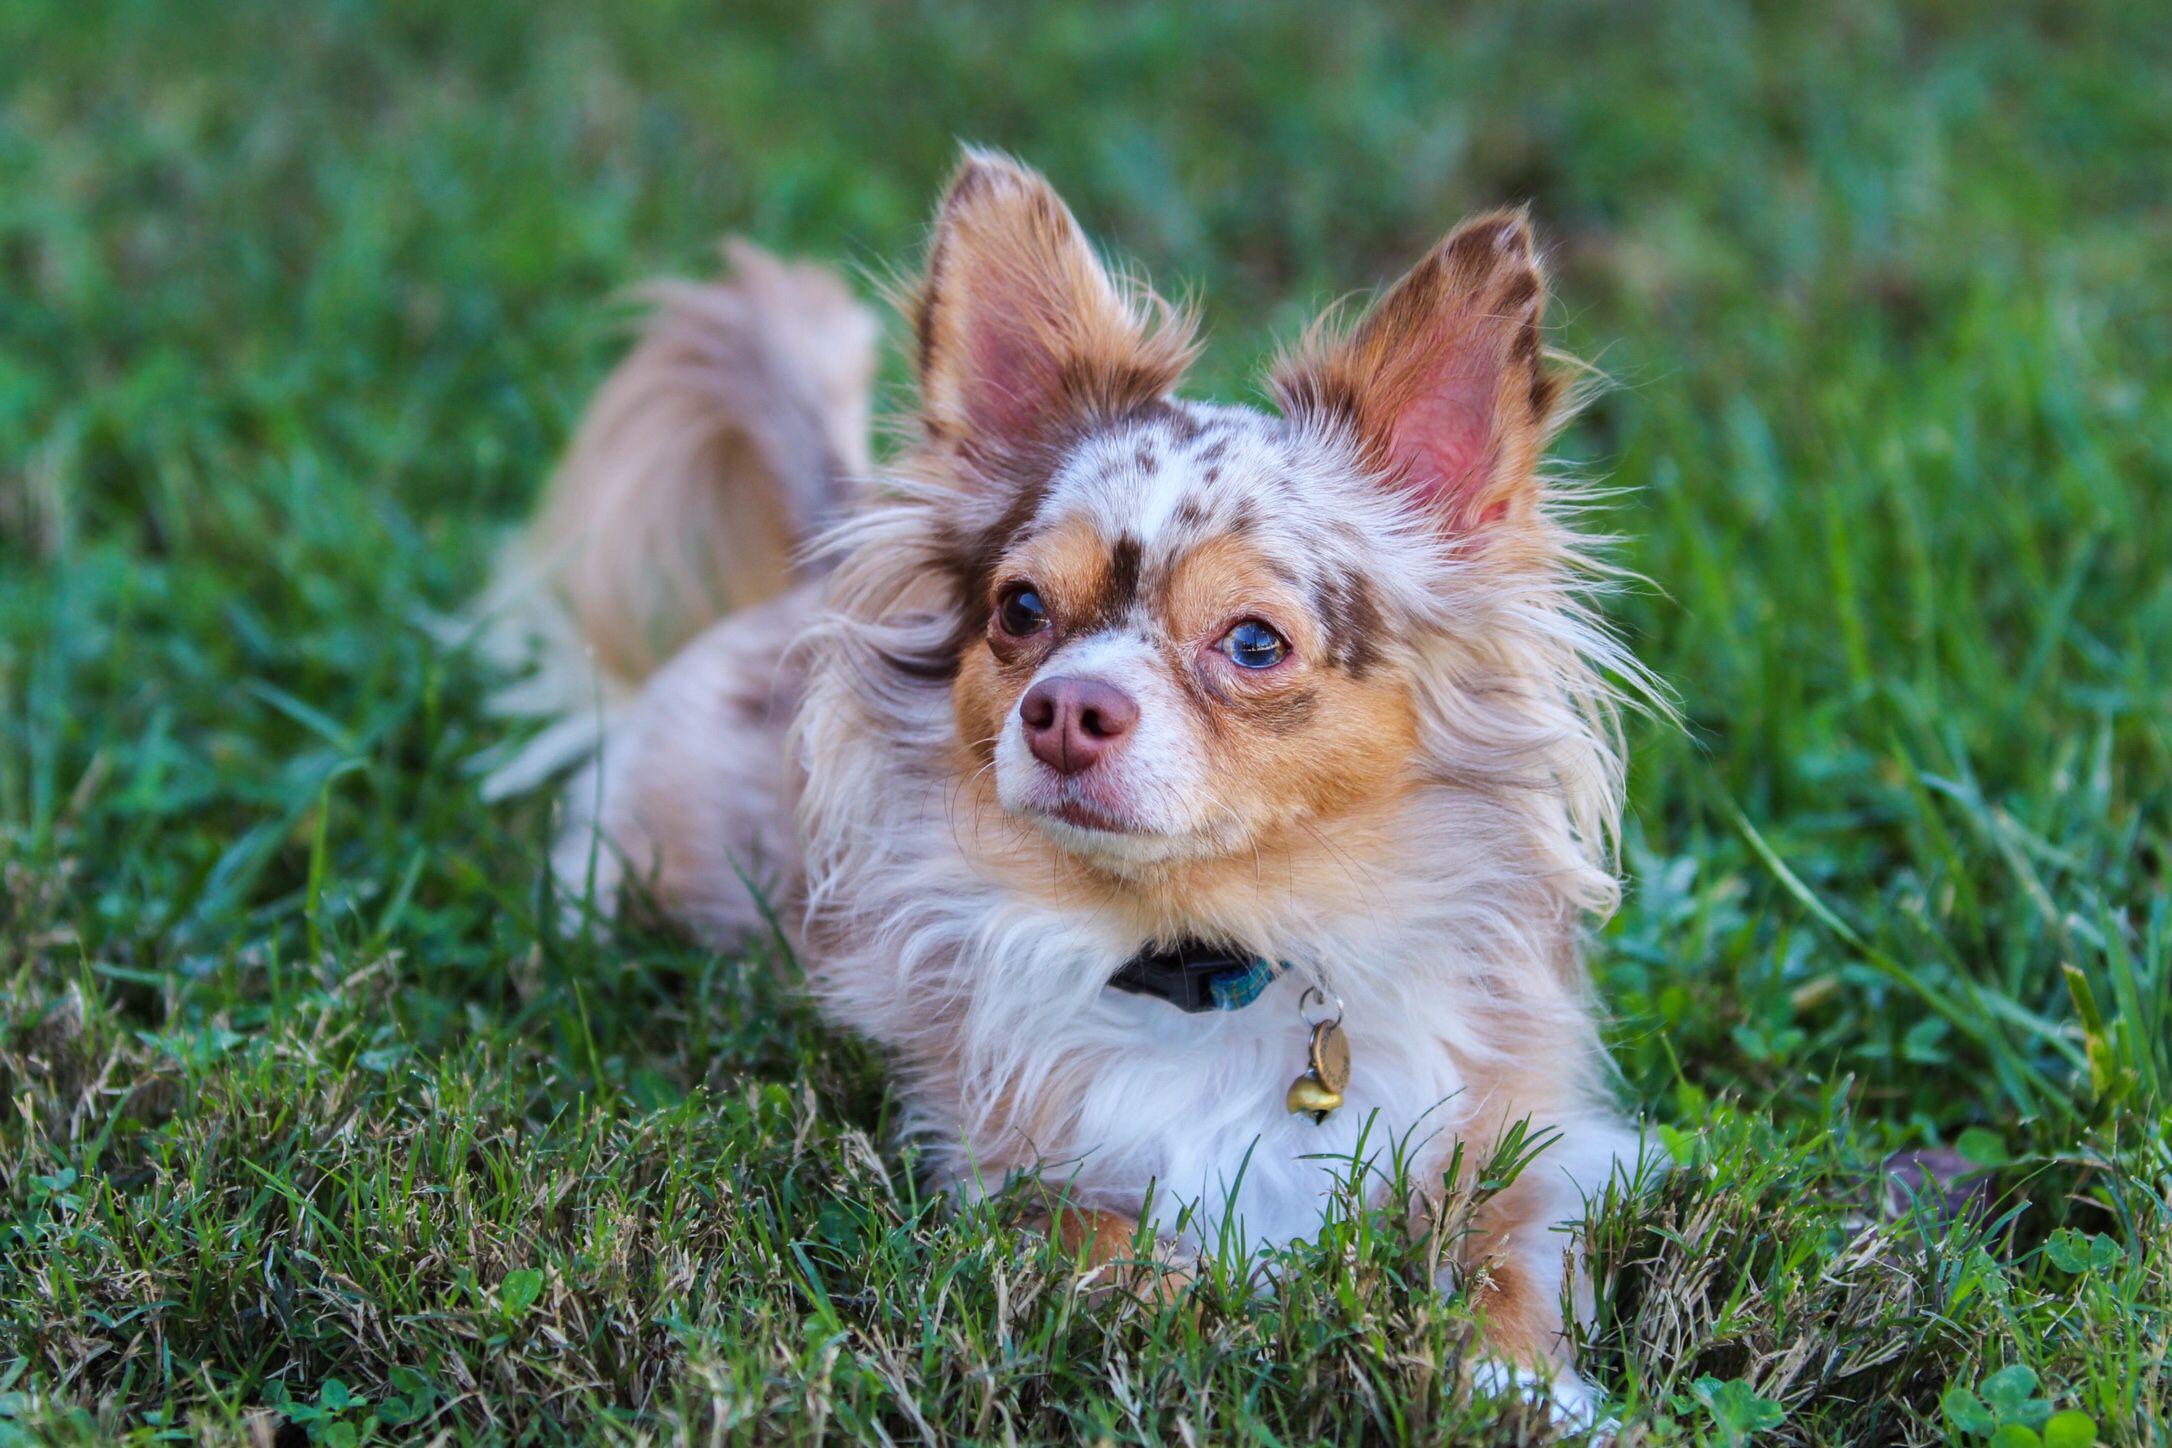 Cooper The Chocolate Merle Chihuahua Chihuahua Love Fluffy Animals